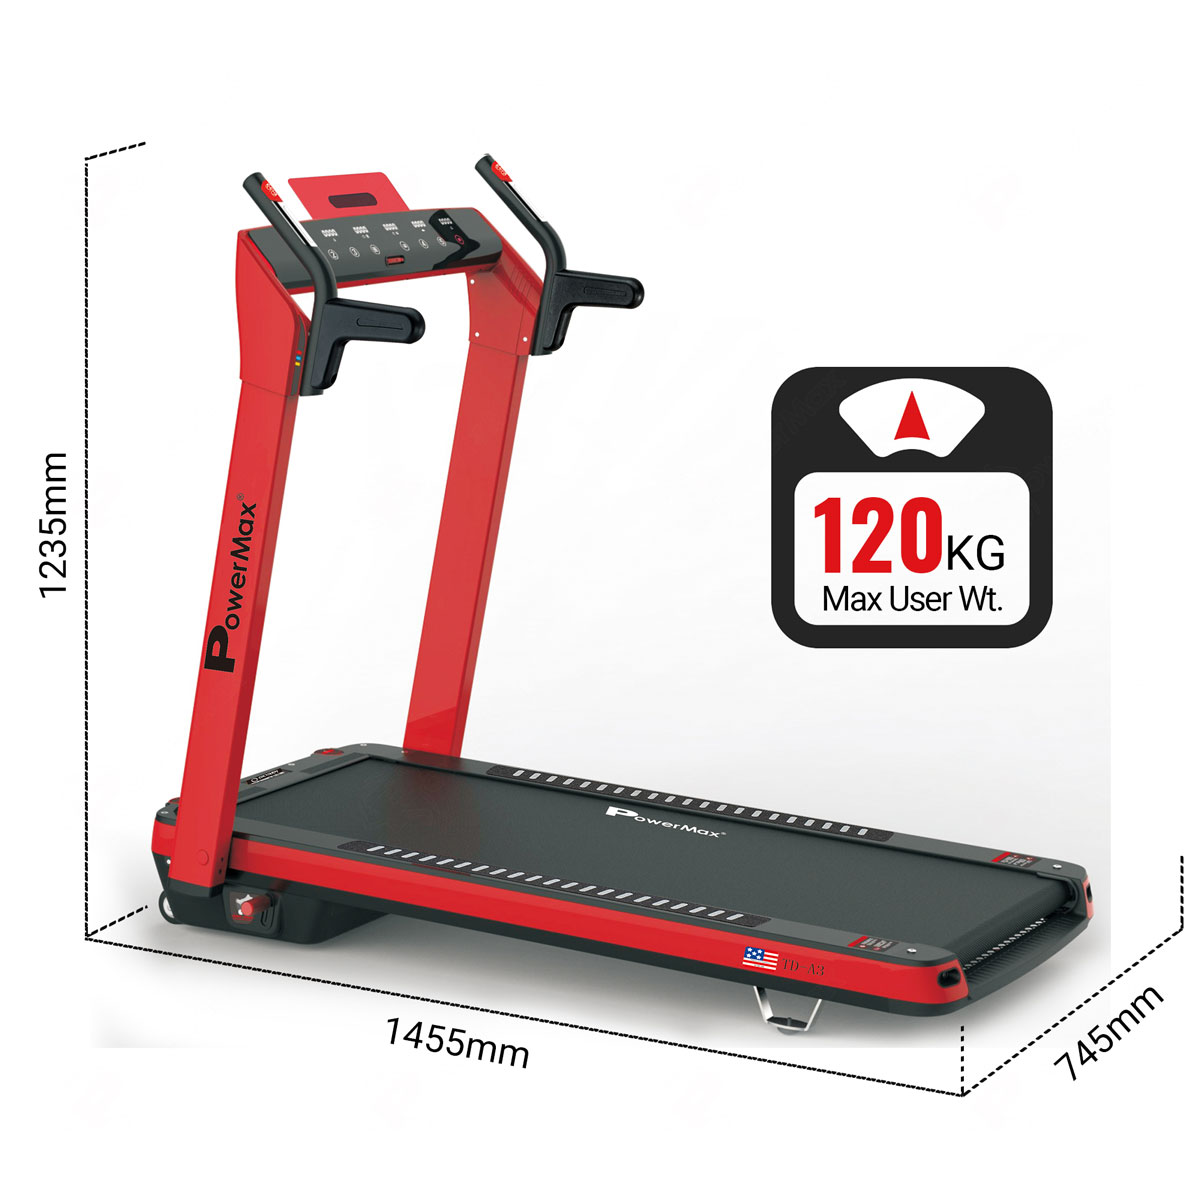 TD-A3 Premium Series Treadmill